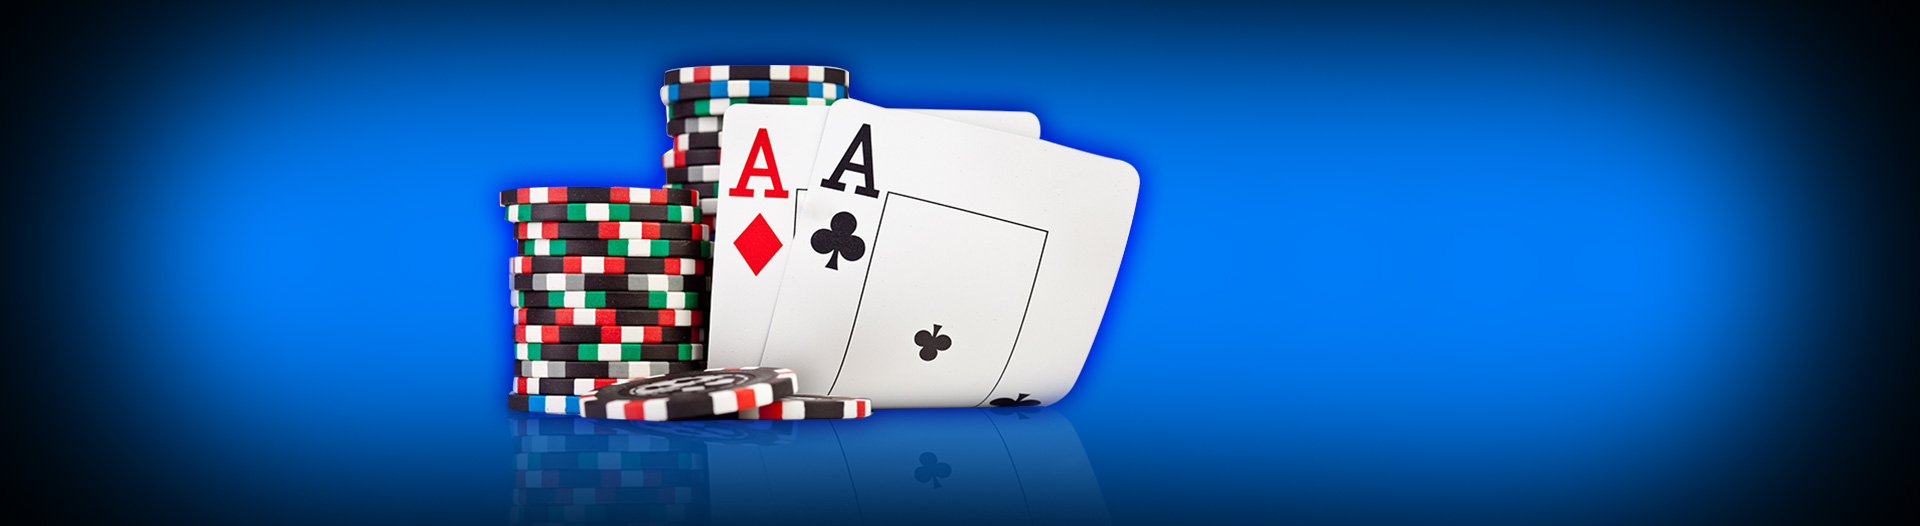 Casino platinum 888 poker España - 26550